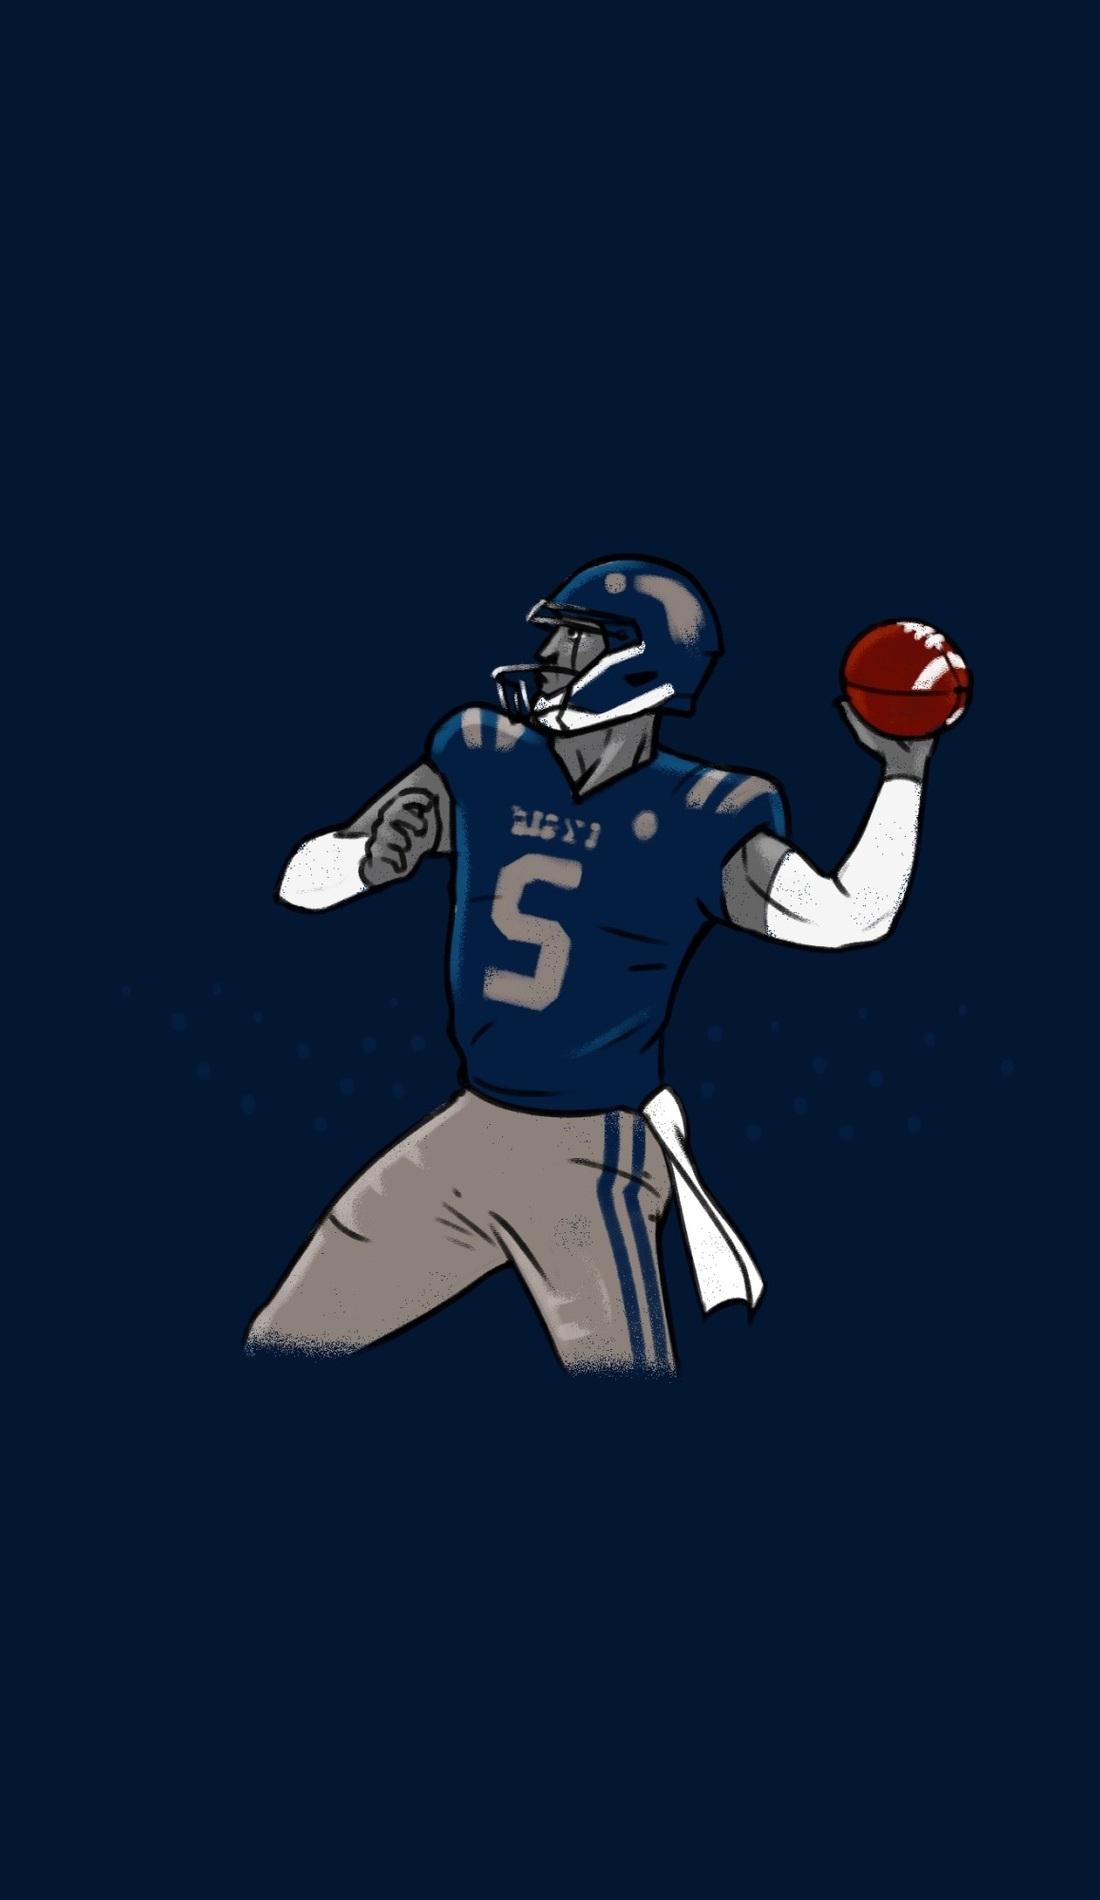 A Georgetown Hoyas Football live event